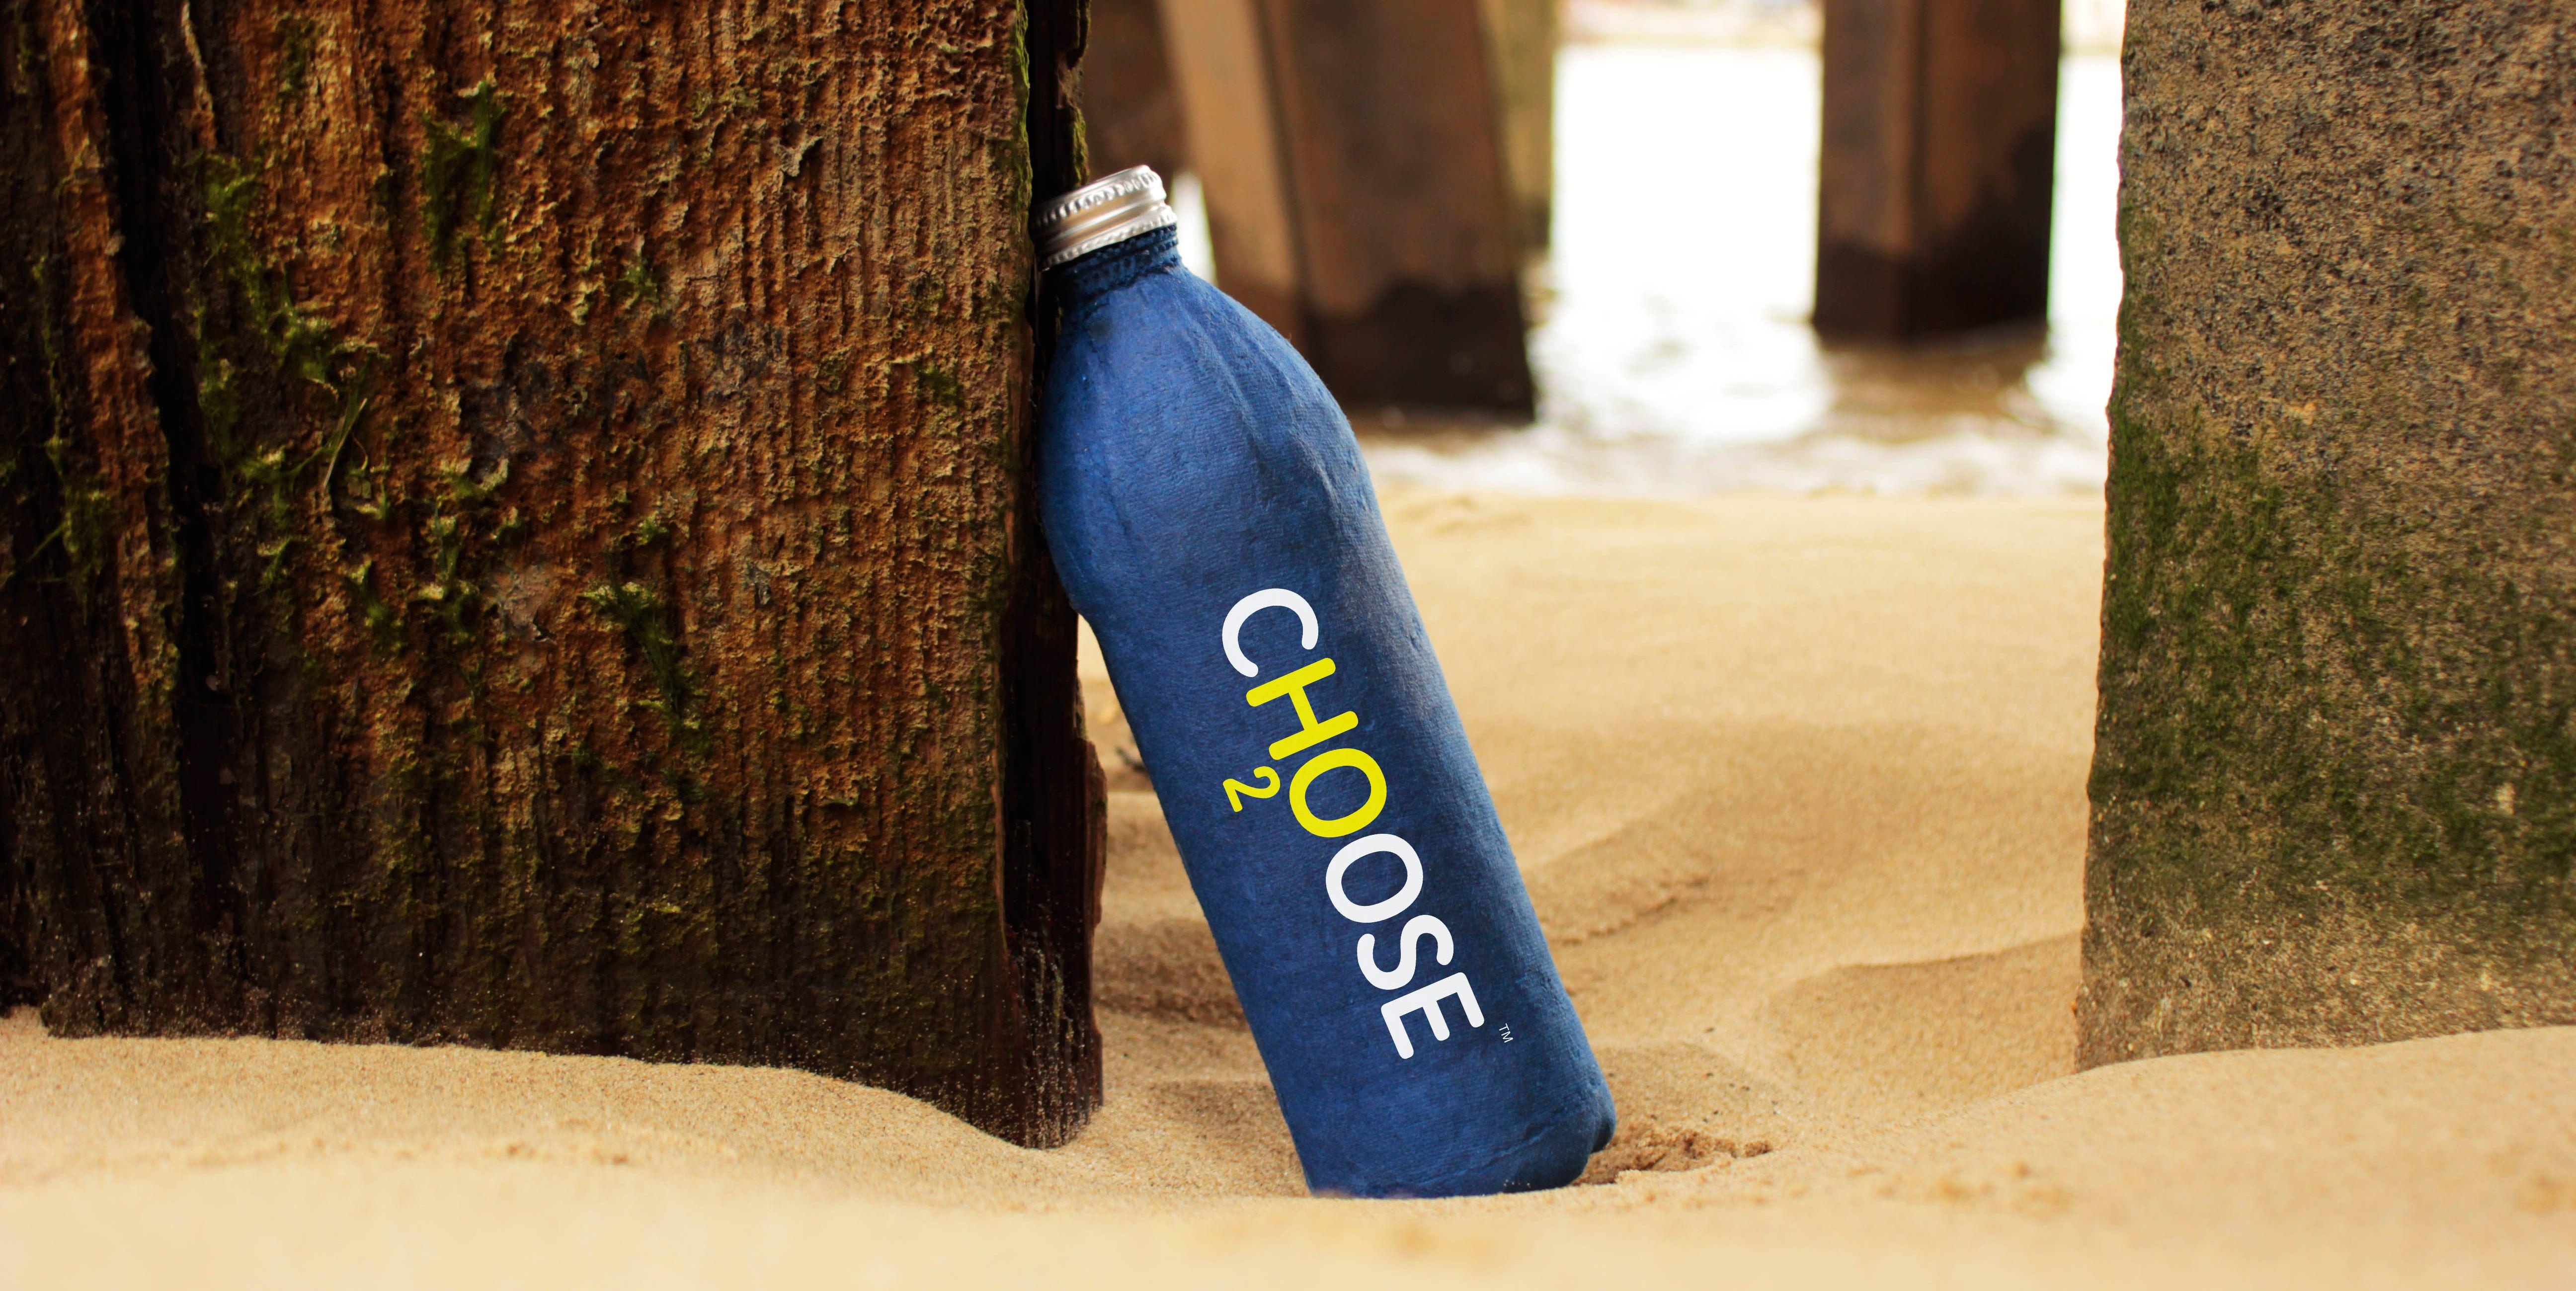 Image result for longcroft water bottle